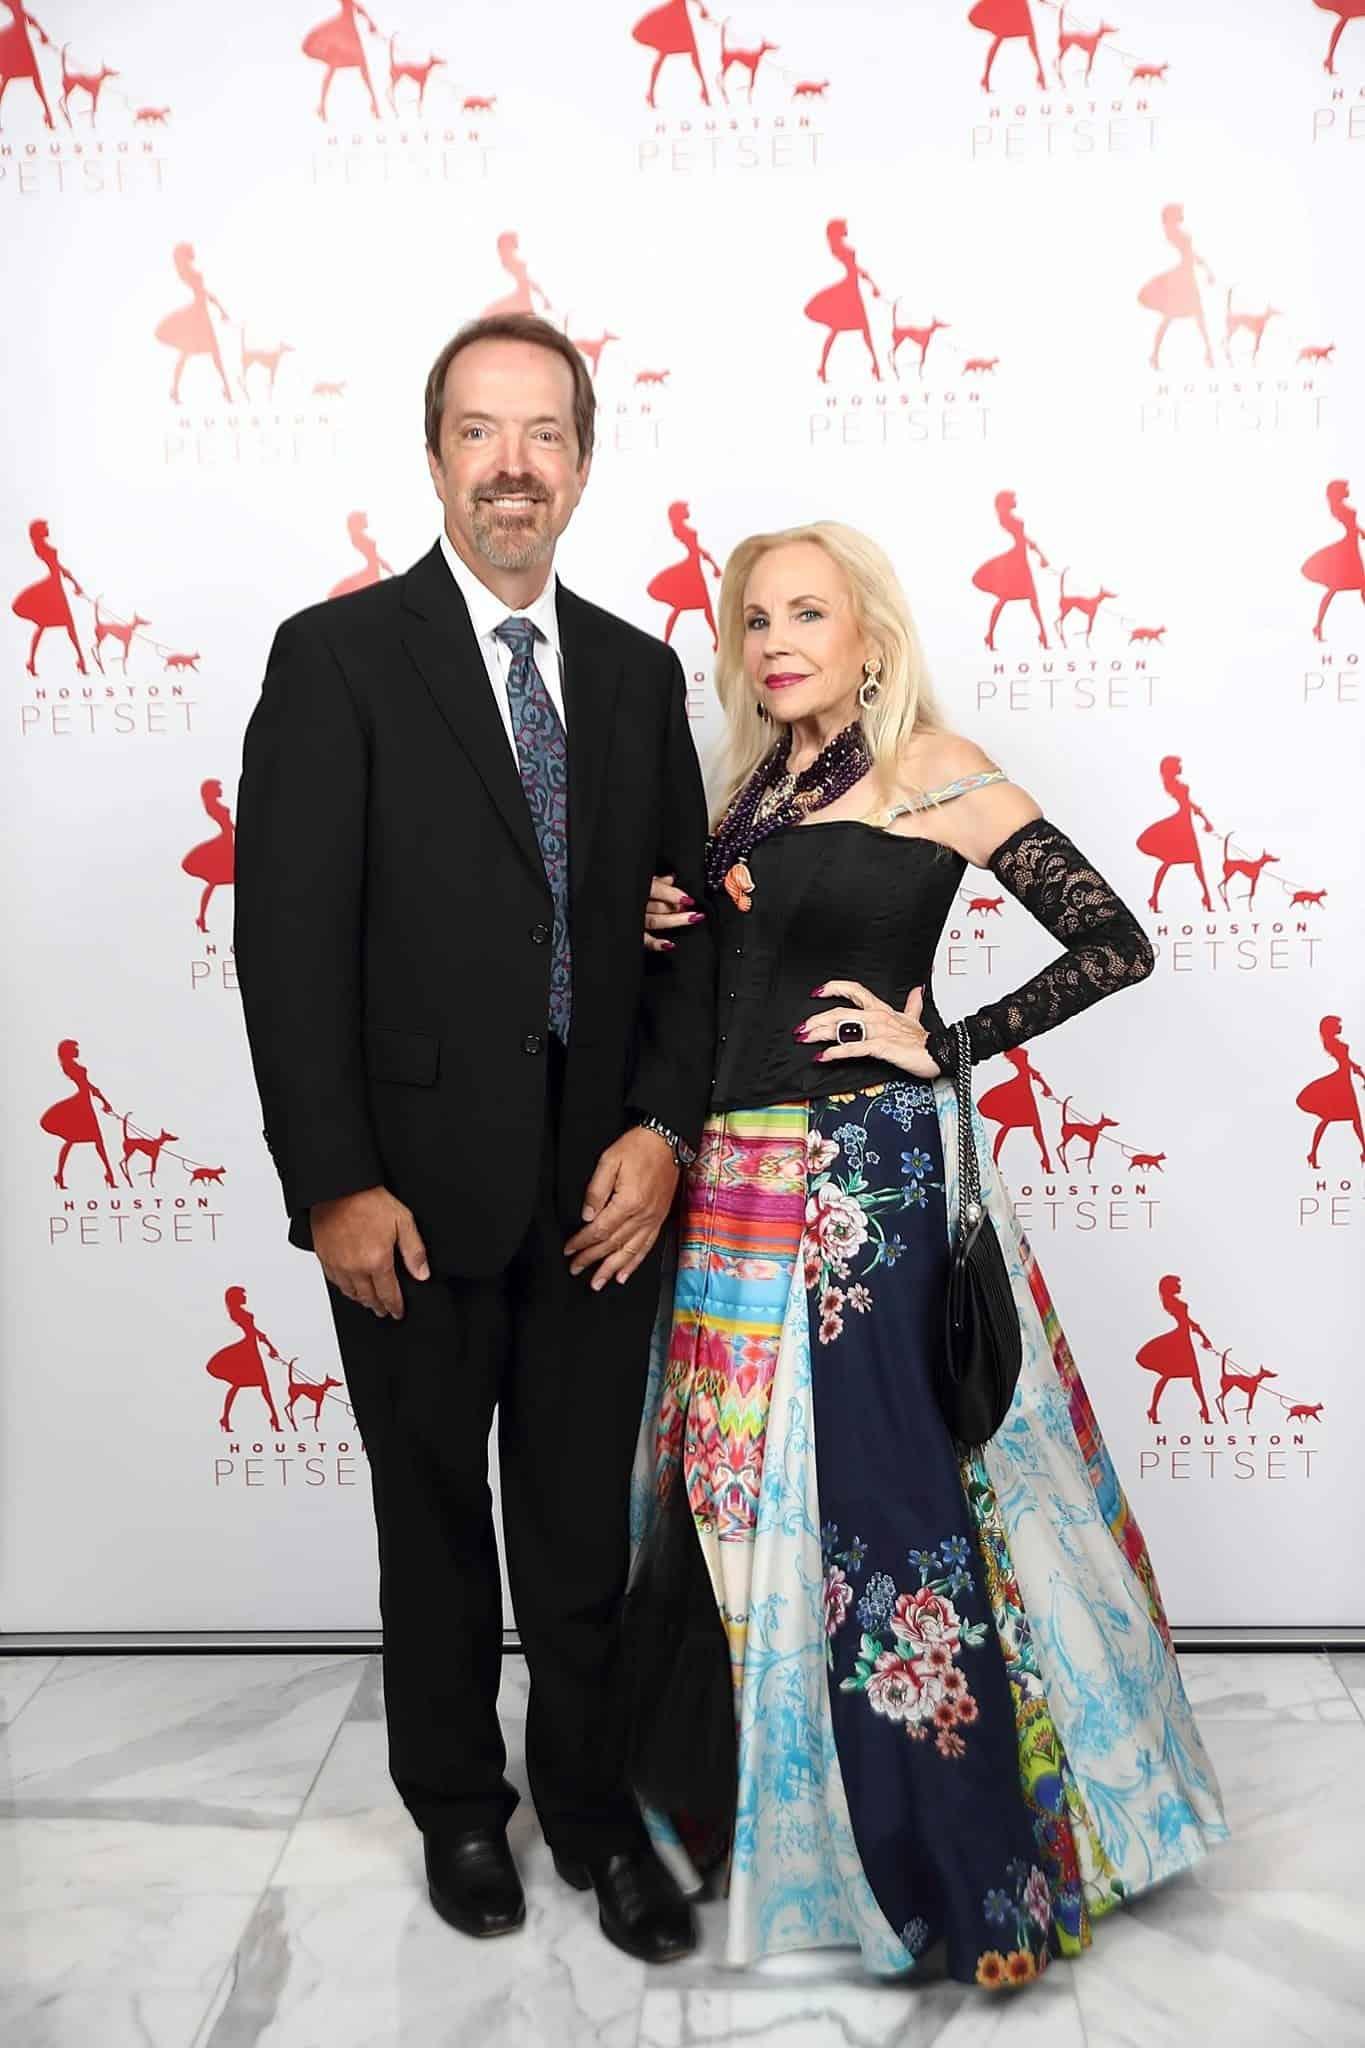 Philip Royalty and Carolyn Farb